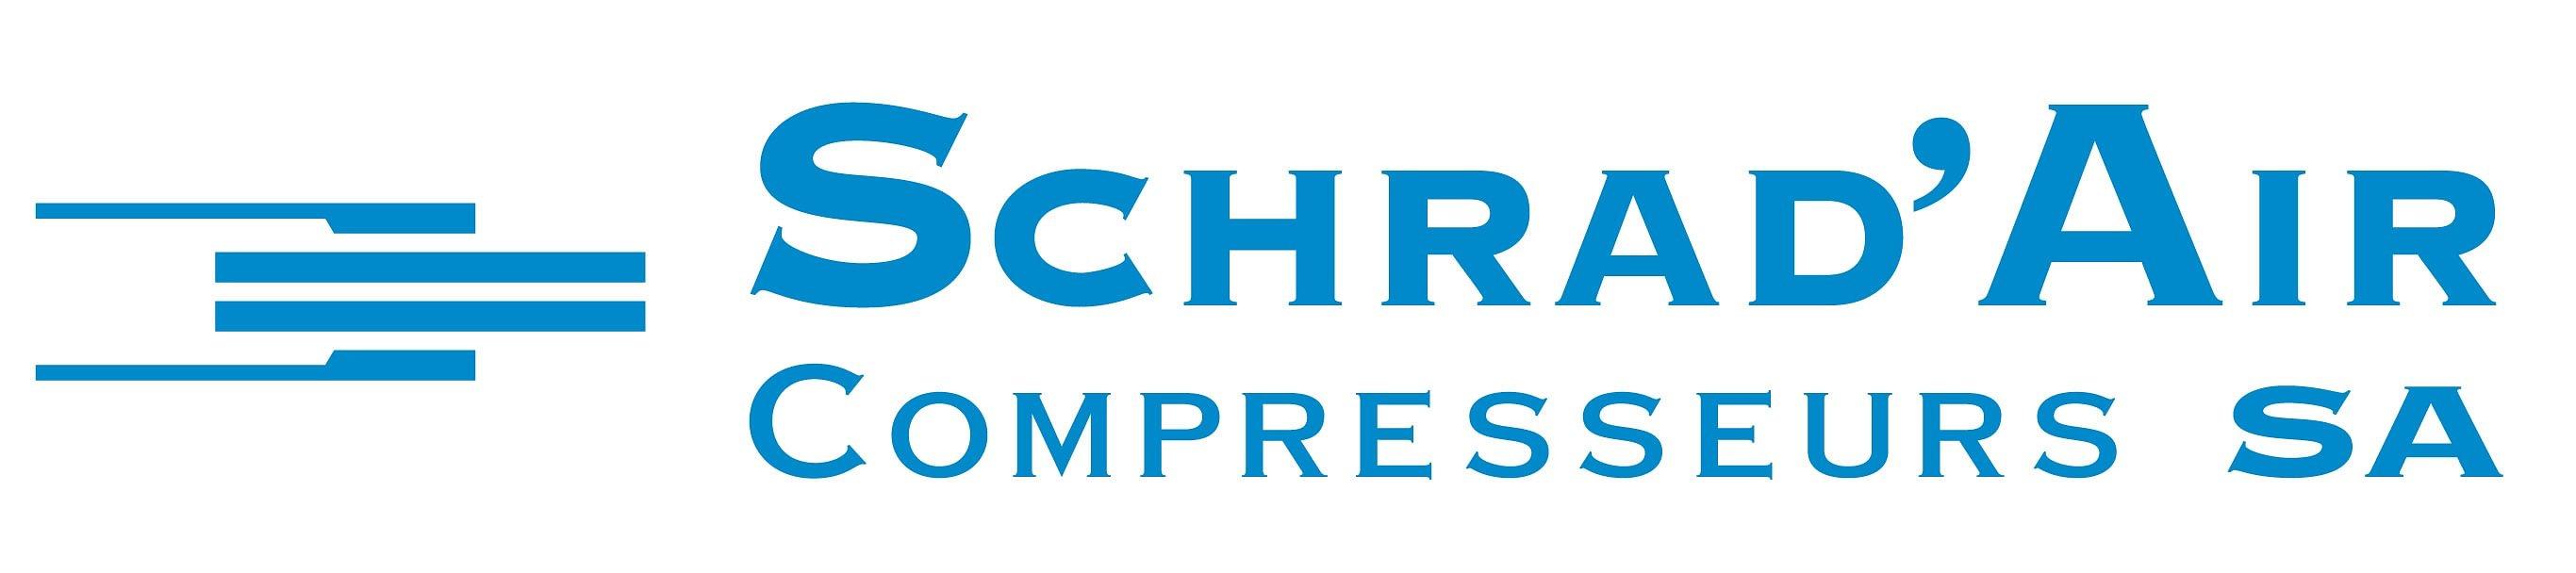 Schrad'Air Compresseurs SA